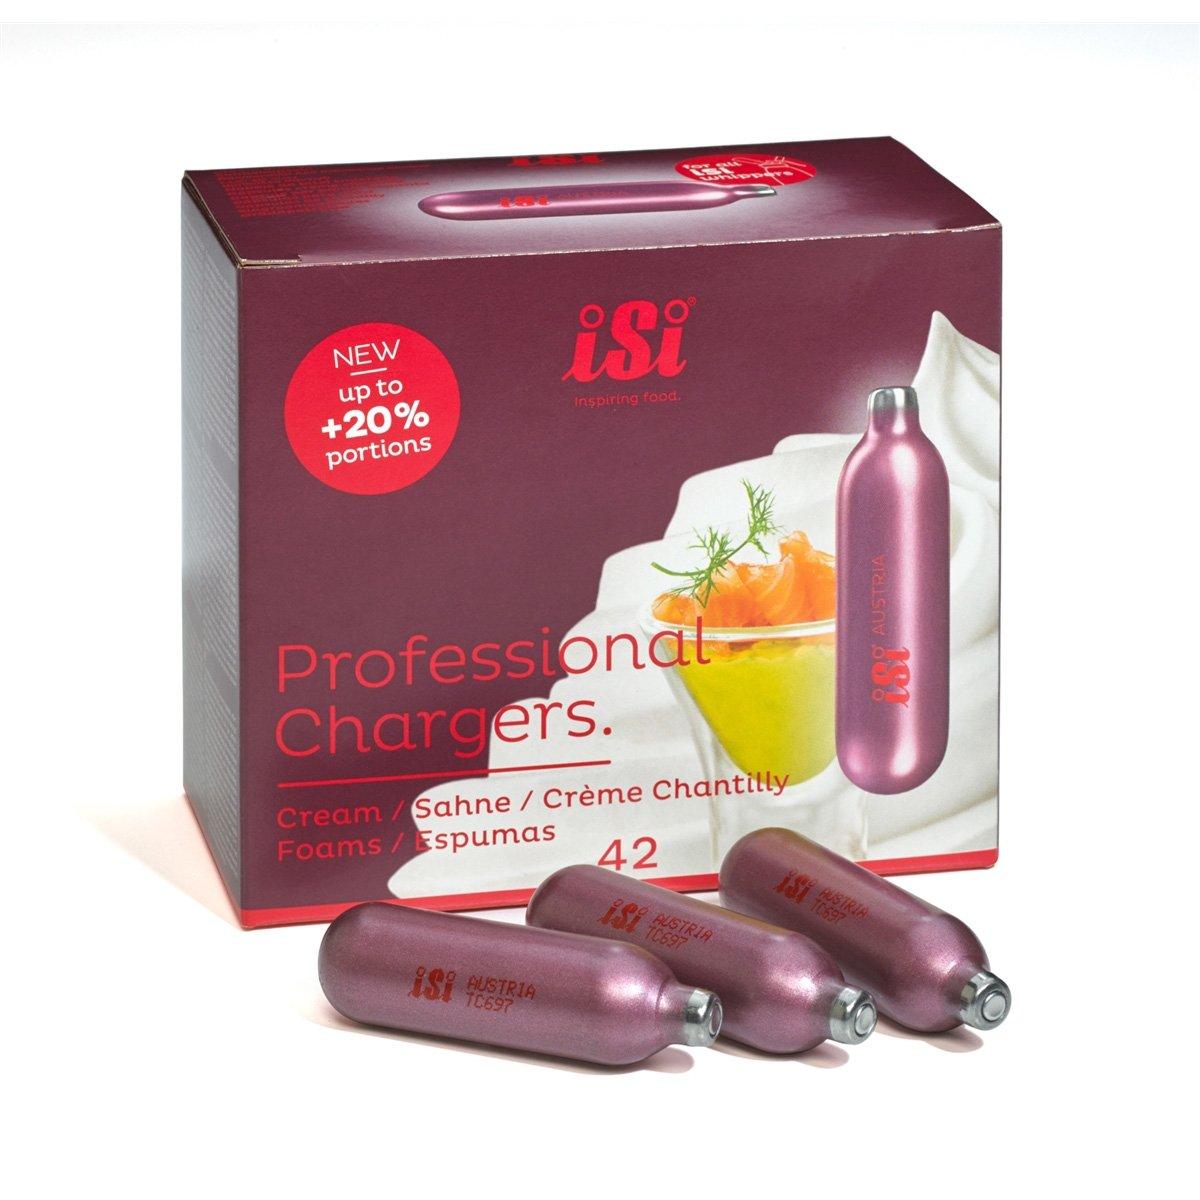 iSi Professional Chargers- Carton of 42-8.4 Gram Nitrous Cream Propellent (42)